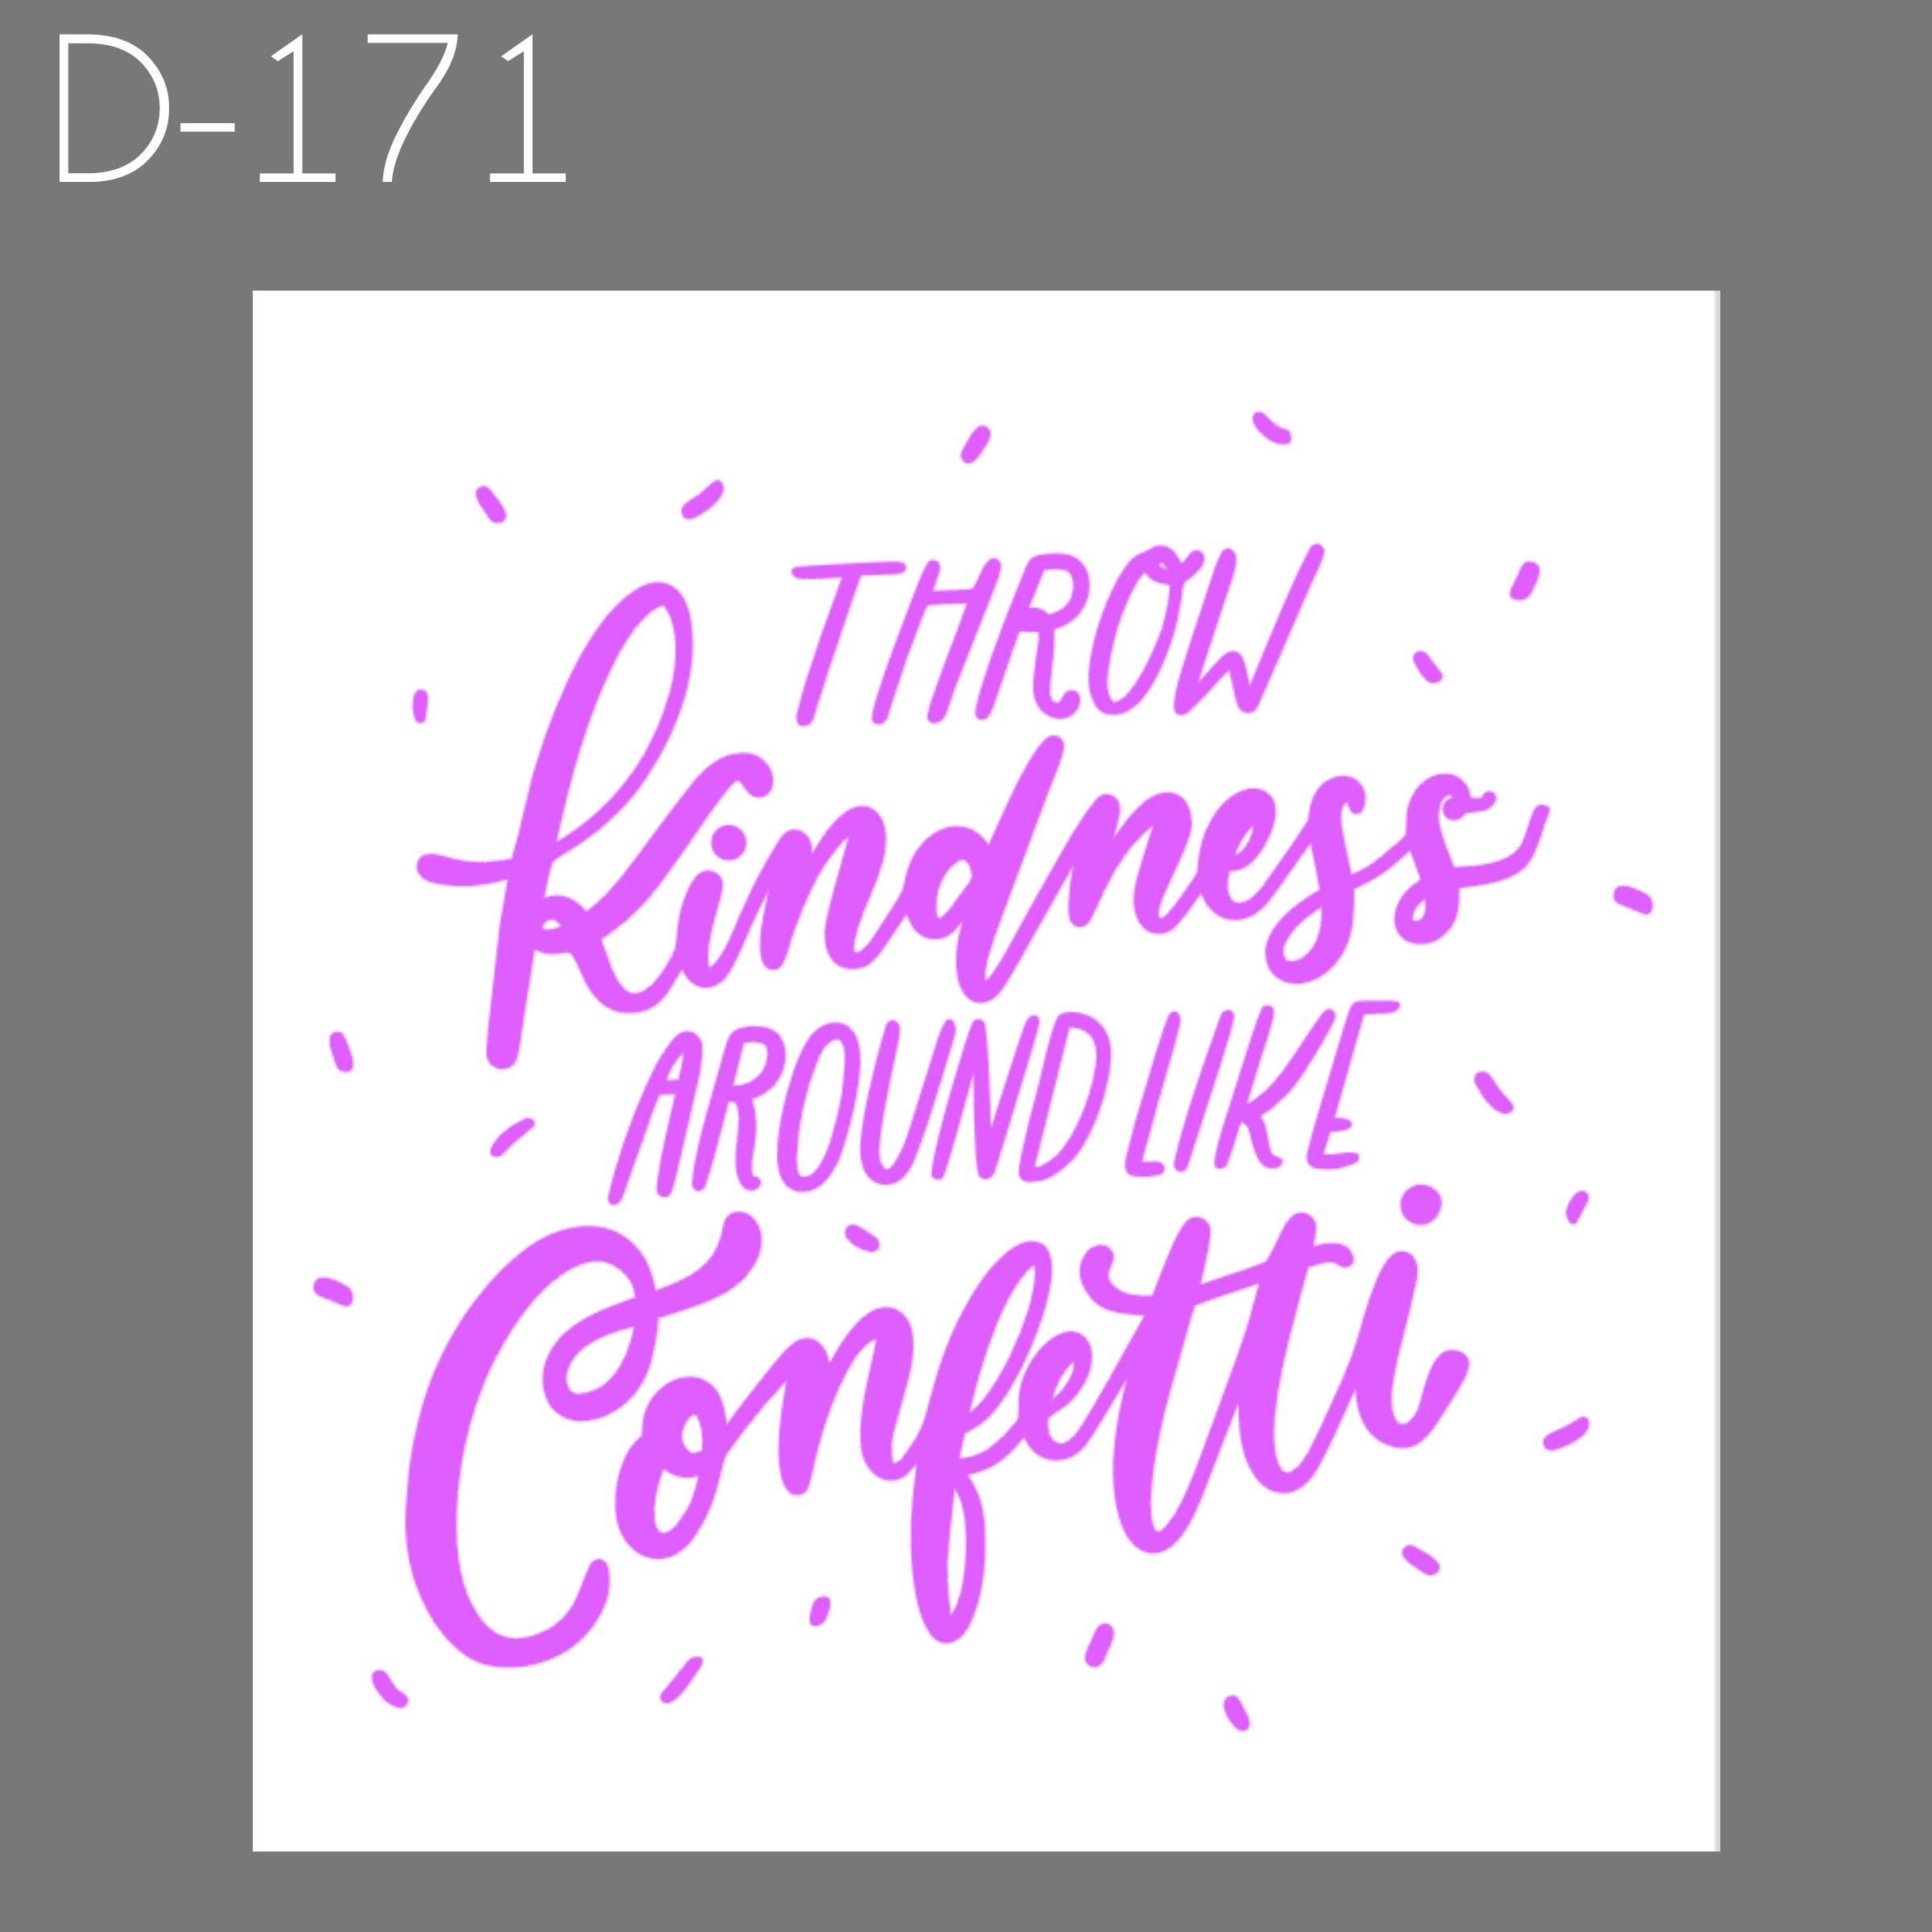 D171 - Confetti.jpg